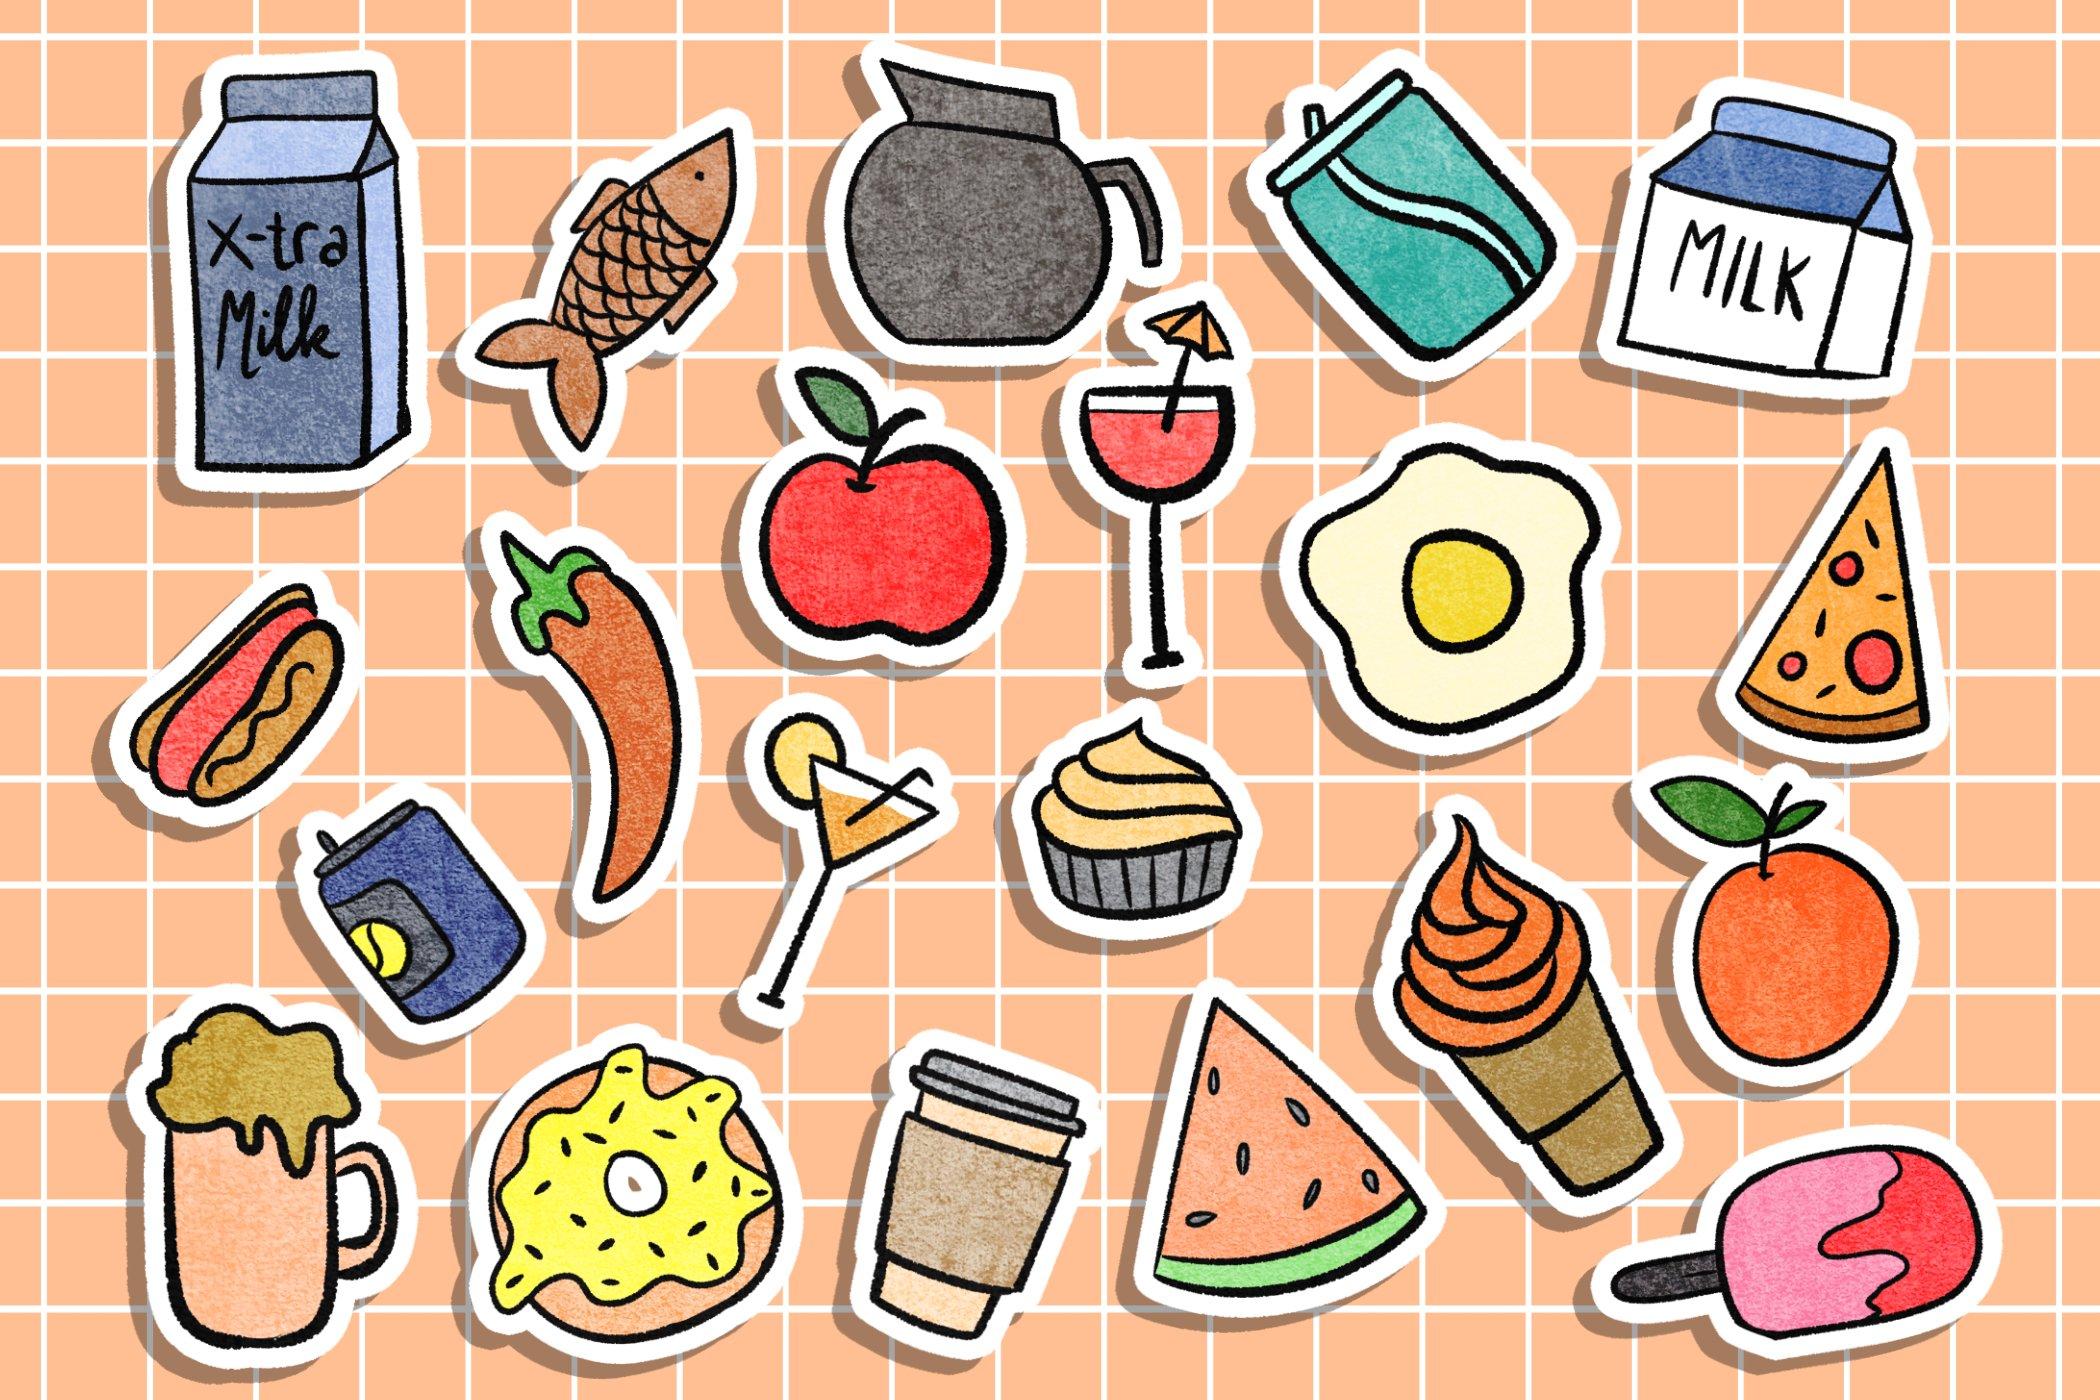 Beverage Stickers Tumblr Aesthetic Digital Download 690349 Stickers Design Bundles